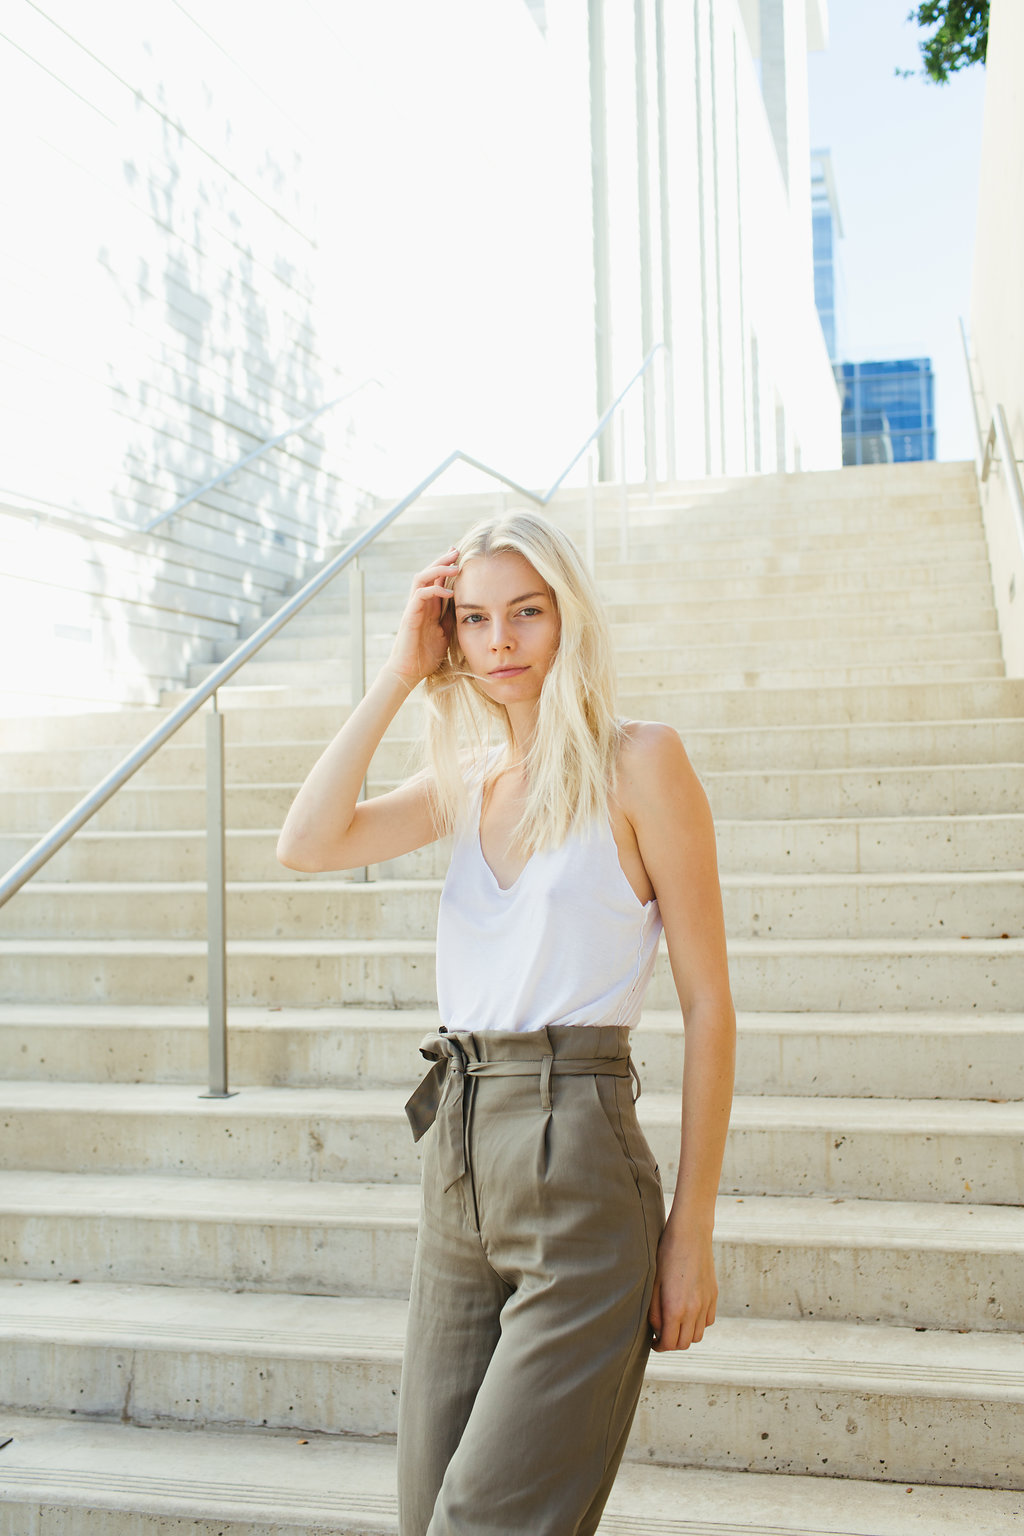 Paige-Newton-Austin-Model-Fashion-Photography0006.jpg